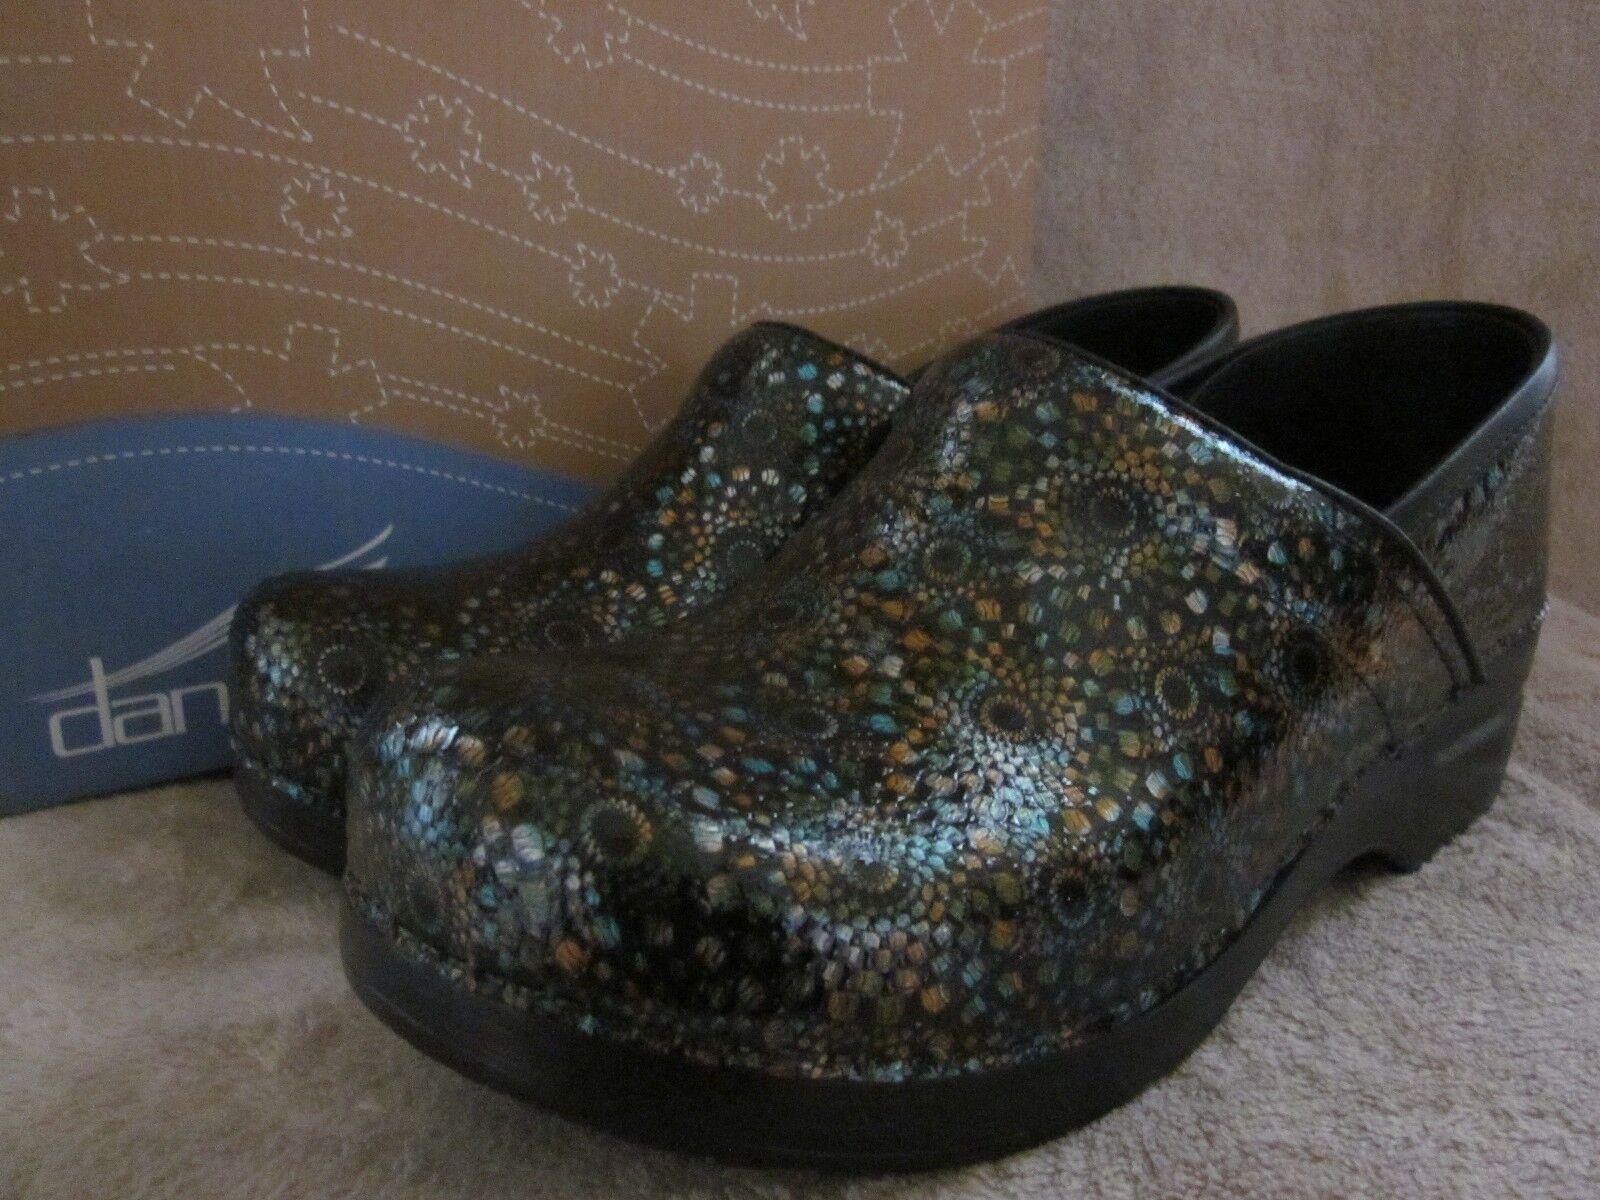 Dansko Professional médaillon cuir sabots chaussures US 10.5 - 11 M 41 euros Neuf avec boîte